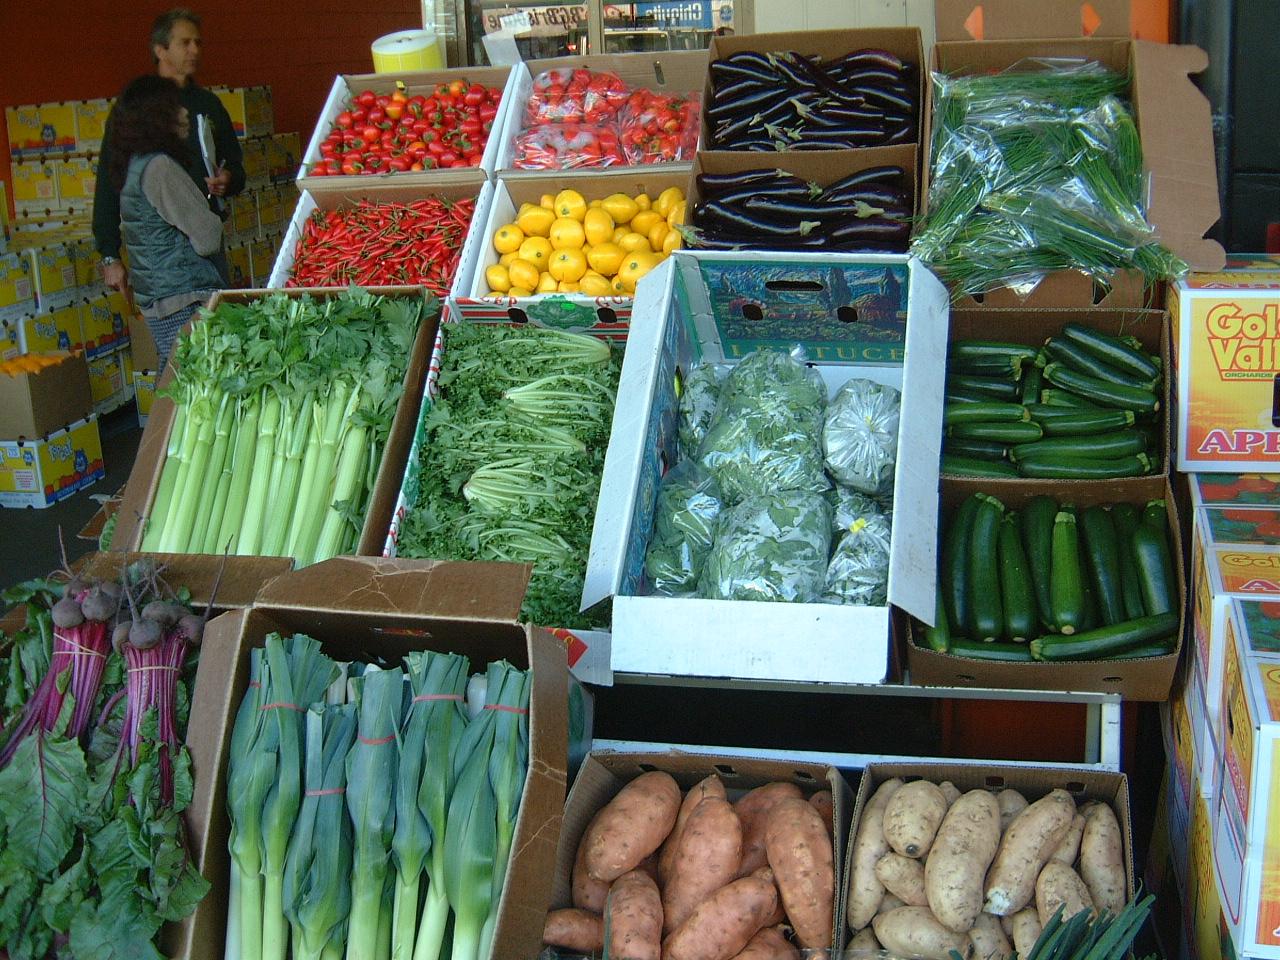 Brisbane Markets Sherwood Road Rocklea Queensland 4106 Jun 2002 I17